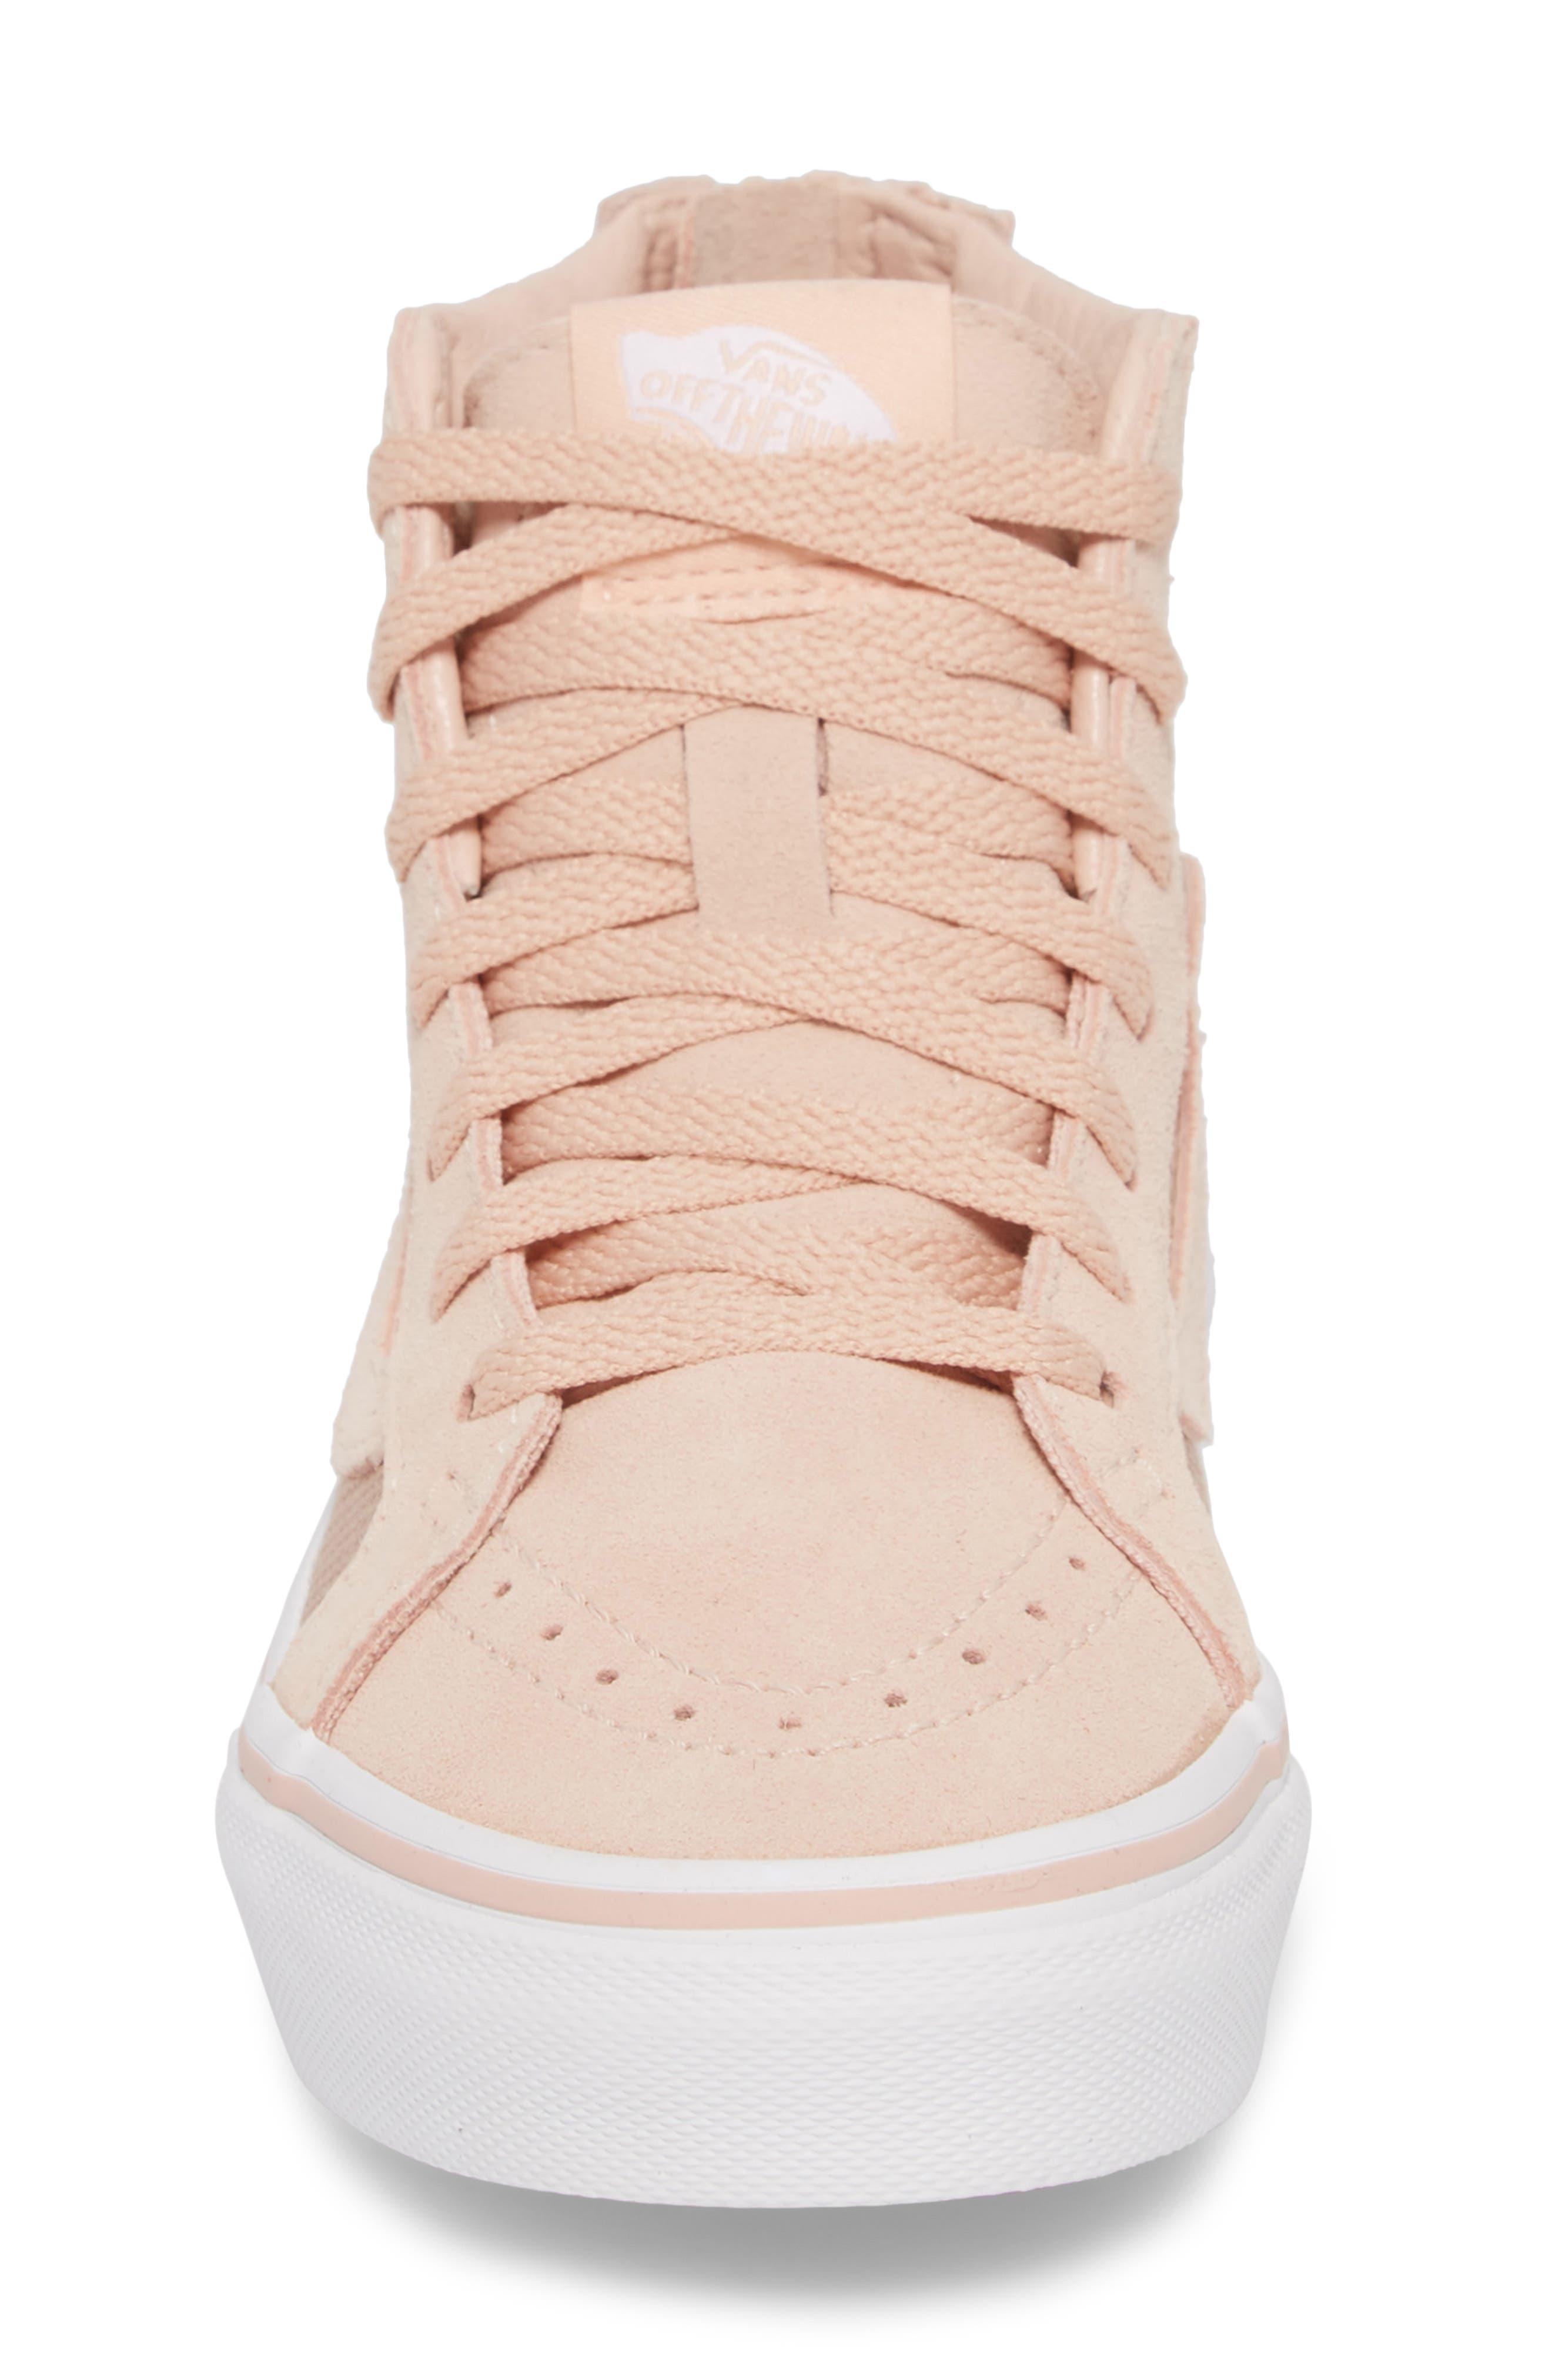 SK8-Hi Zip Sneaker,                             Alternate thumbnail 4, color,                             Rose Gold Suede Leather